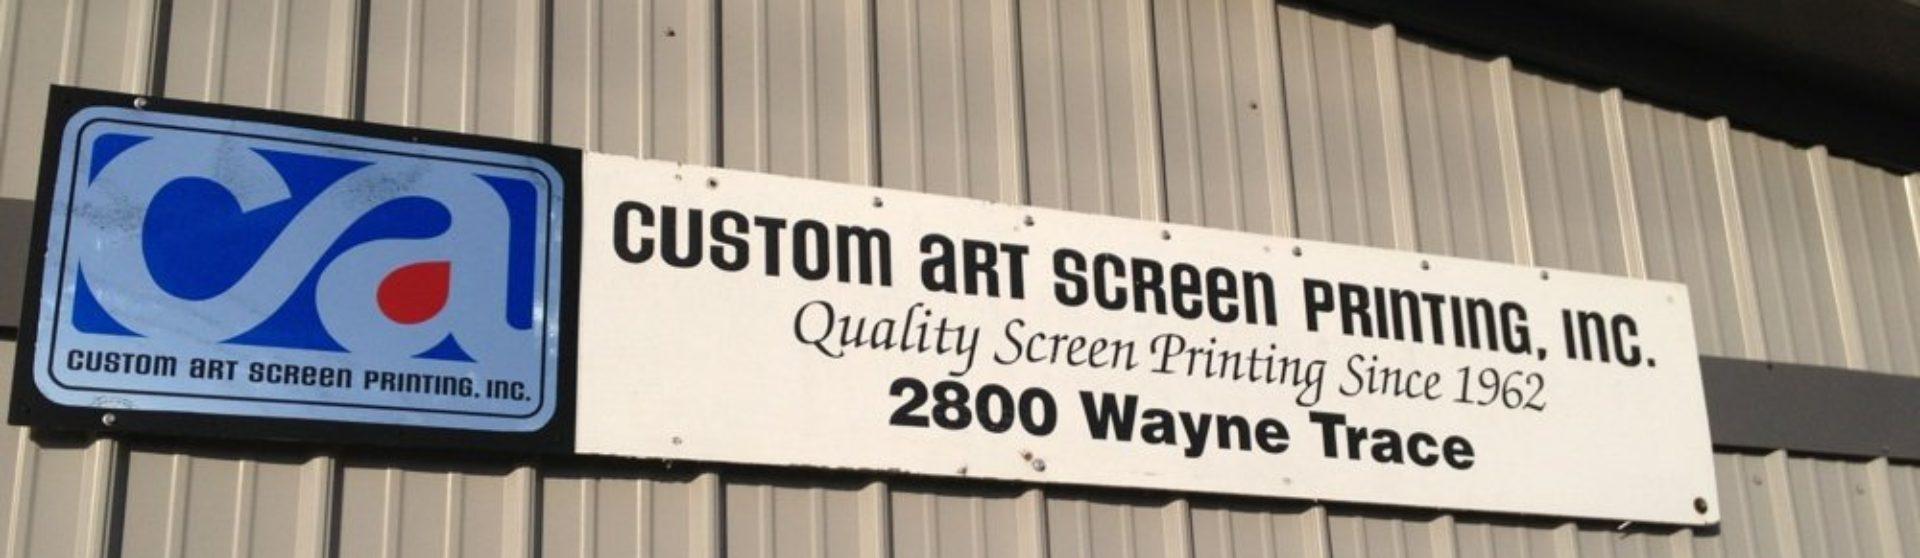 Custom Art Screen Printing Inc